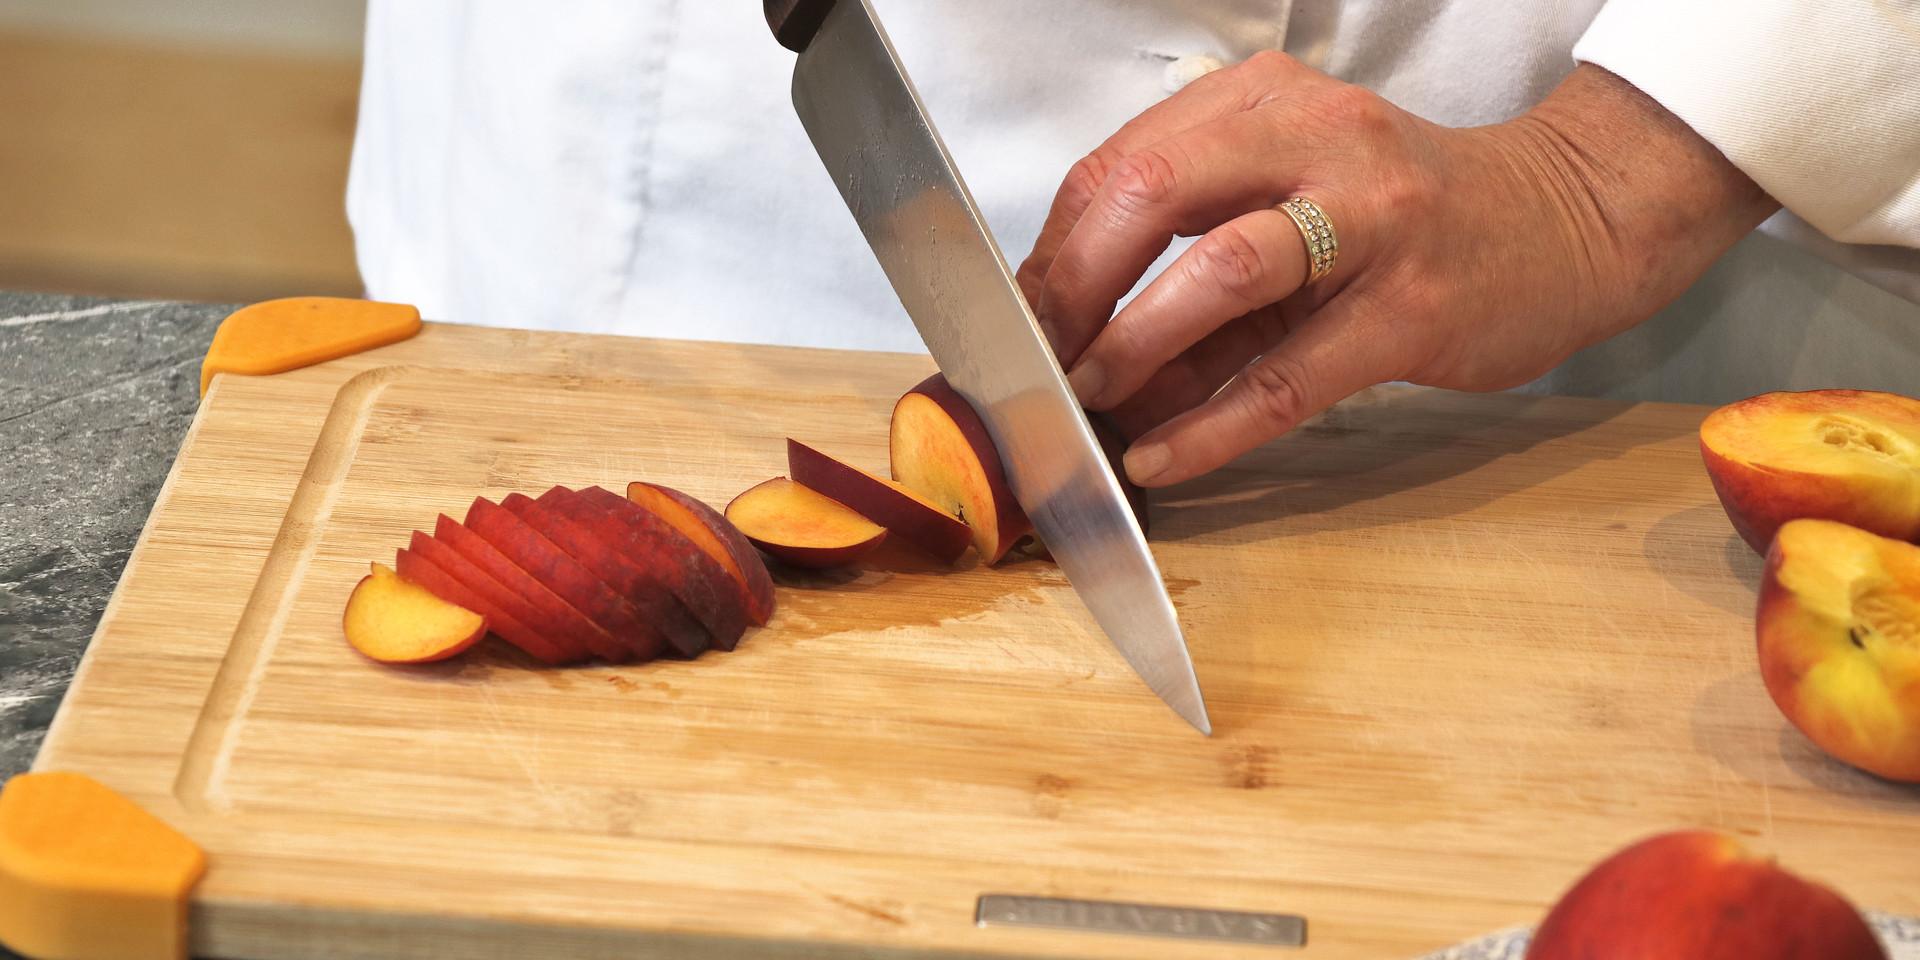 R&C peach prep slicing close up.jpg